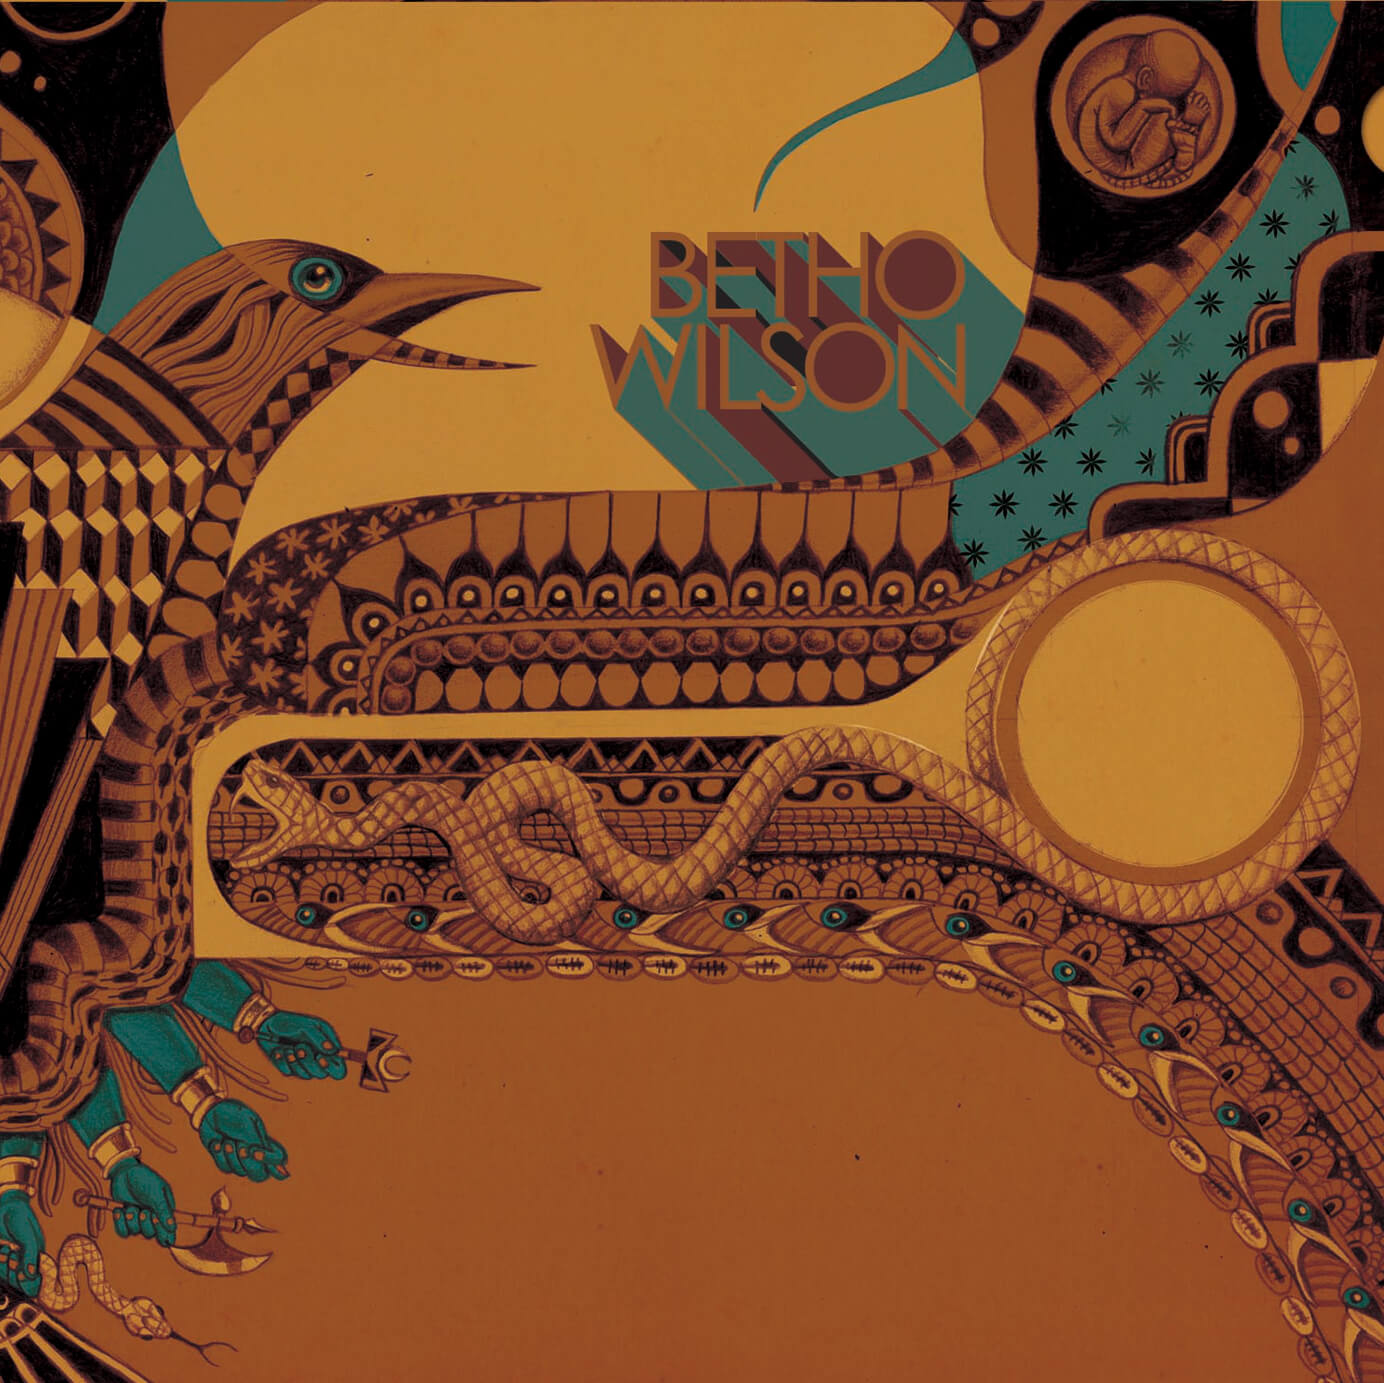 CAPA - CD - BETHO WILSON PASSARO PRETO (1) (1)